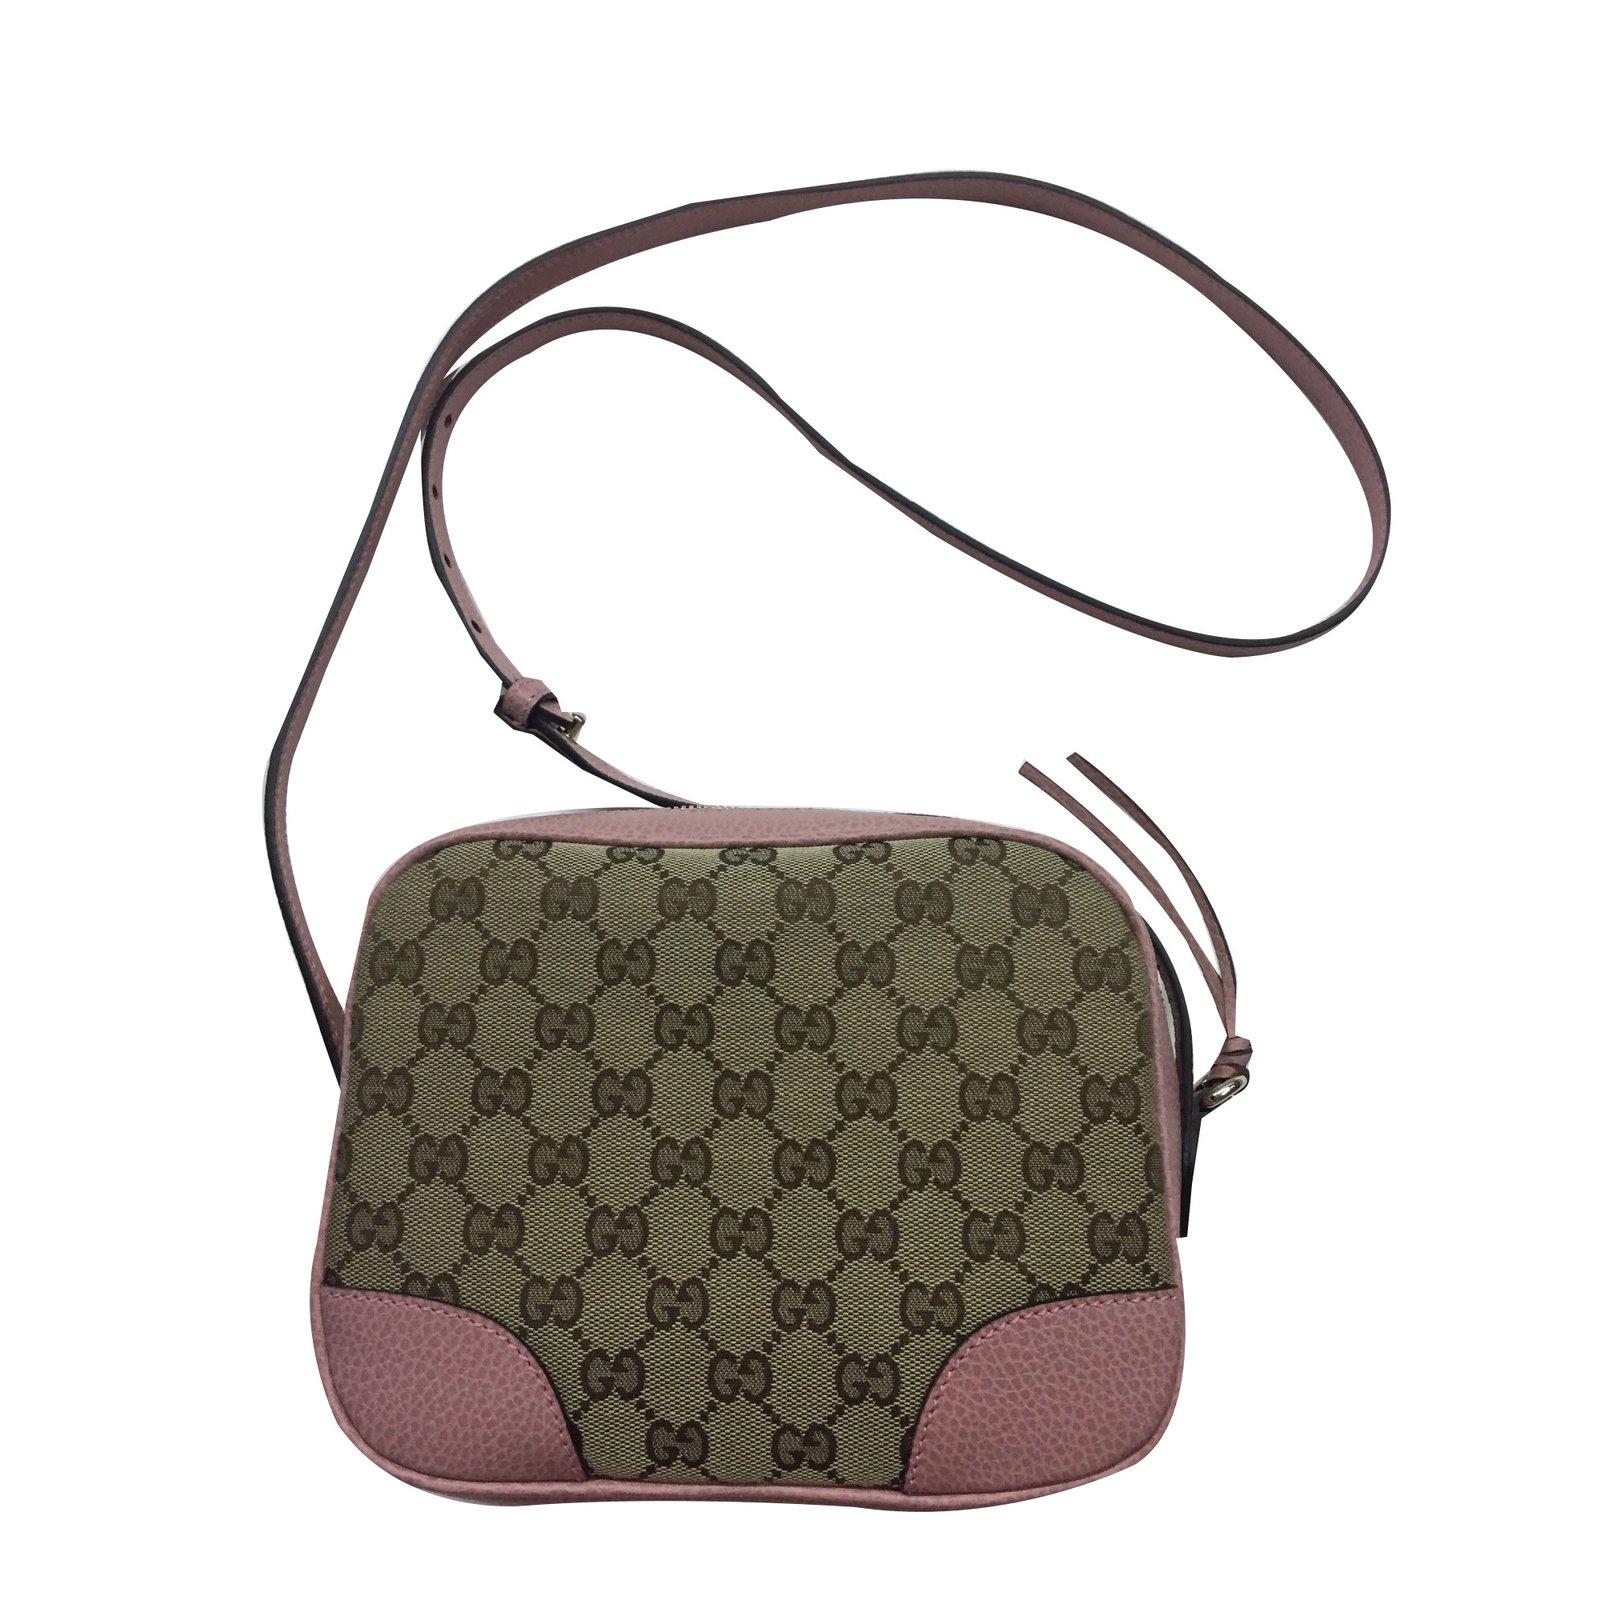 Gucci Soho Disco Bag Handbags Leather Pink Ref42669 Joli Closet